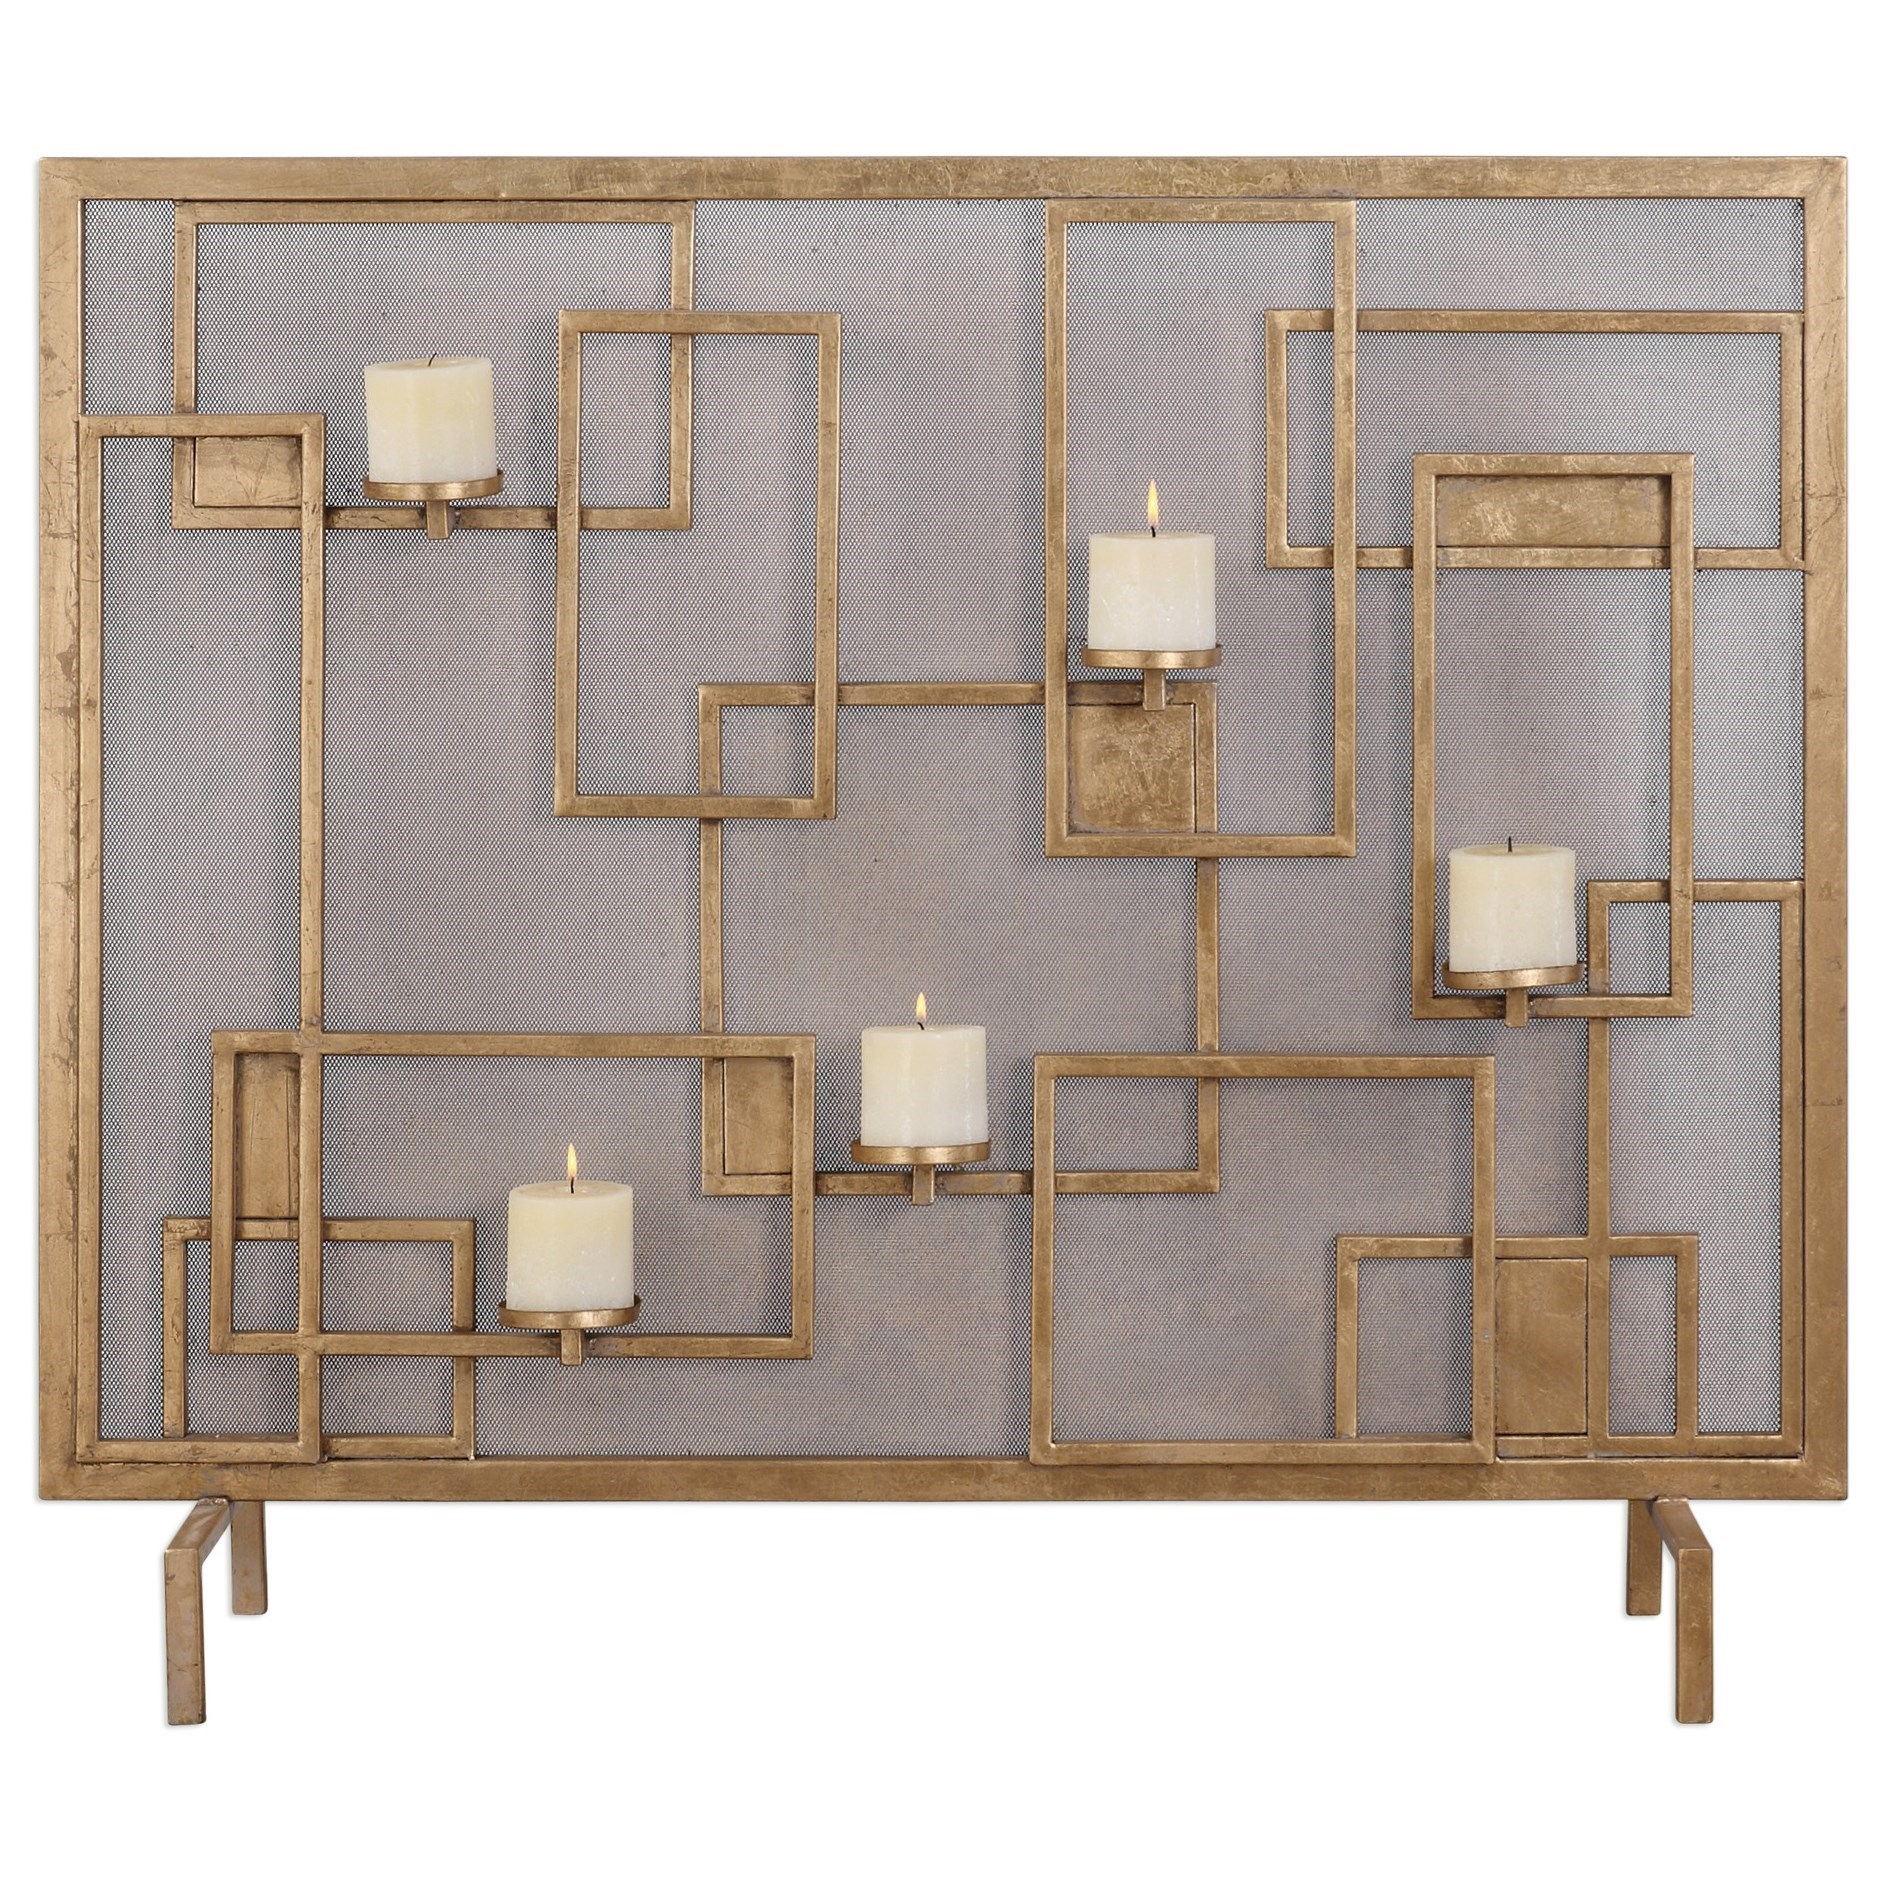 Uttermost Accessories  Mara Fireplace Screen Candleholder - Item Number: 20179